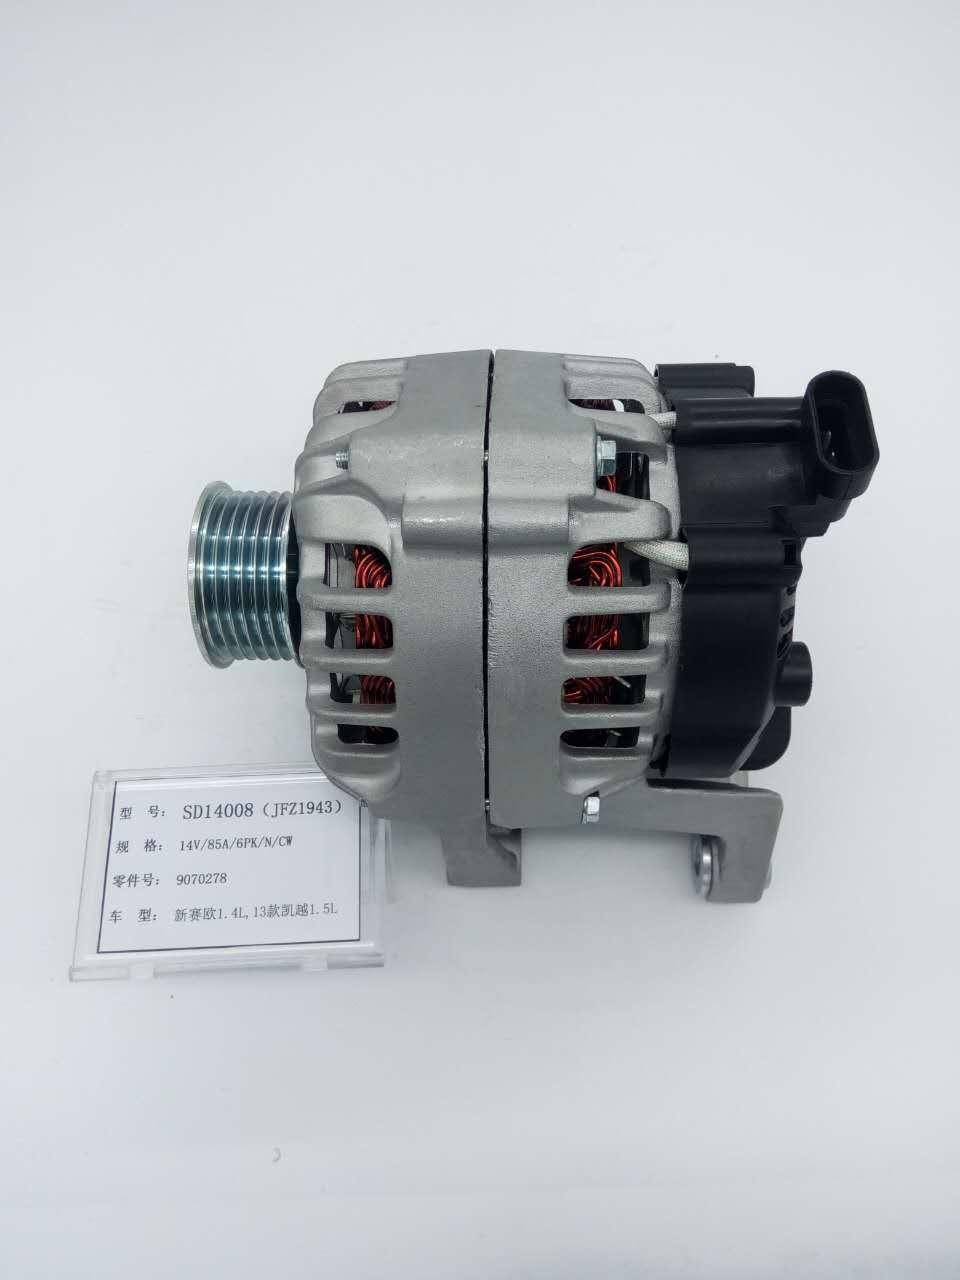 Excelle 1.5L alternator 9070278 SG8C040